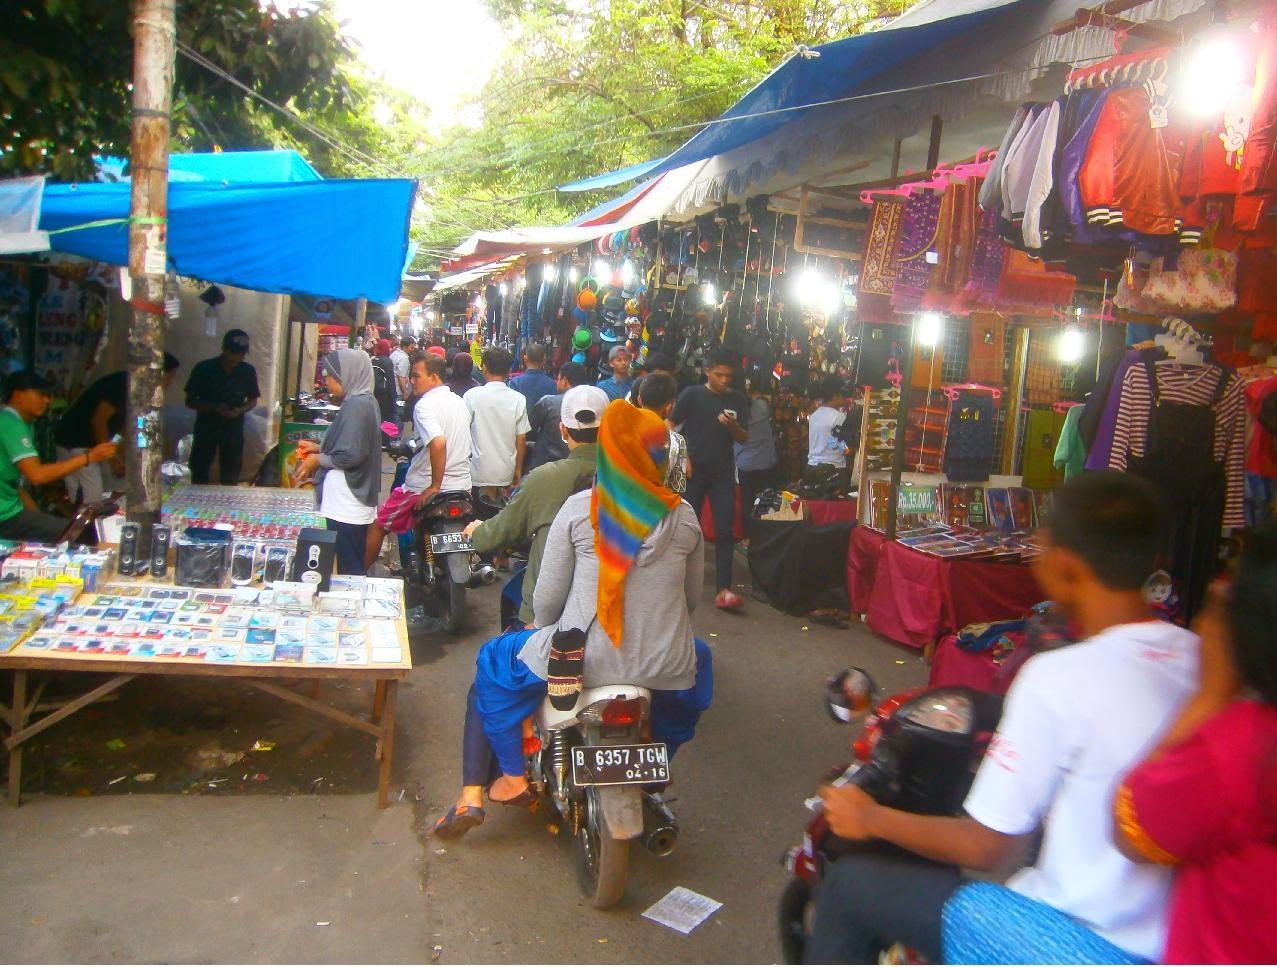 Panitia Siapkan 250 Stand Bagi UKM Kopik Pulo Gadung Jaktim Gelar Ramadhan Fair